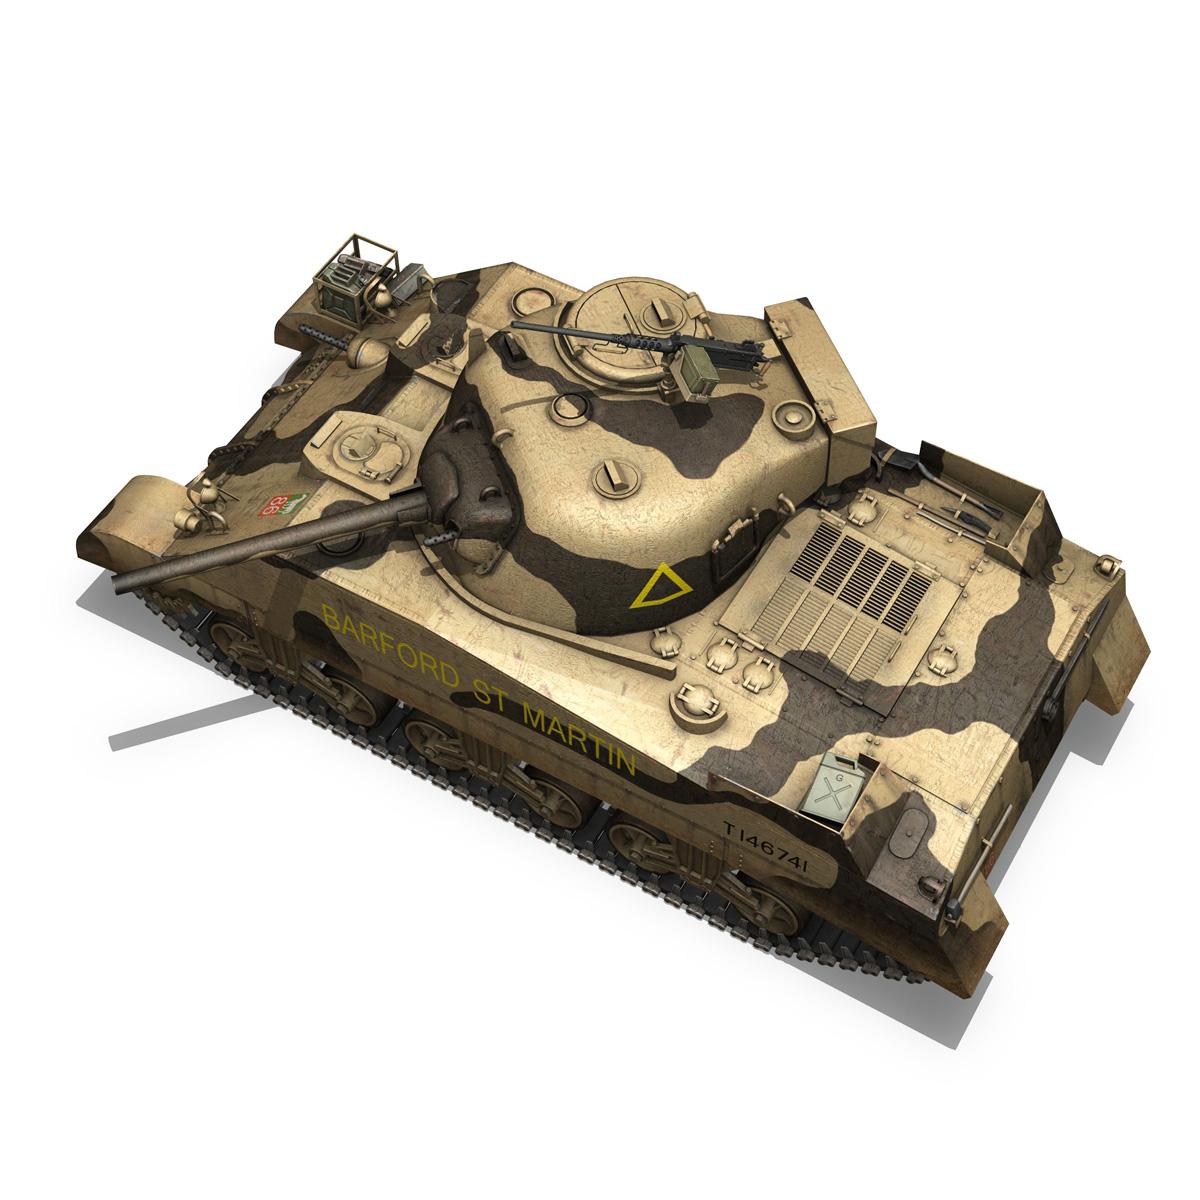 M4 Sherman MK.III - Barford St Martin 3d model  266958